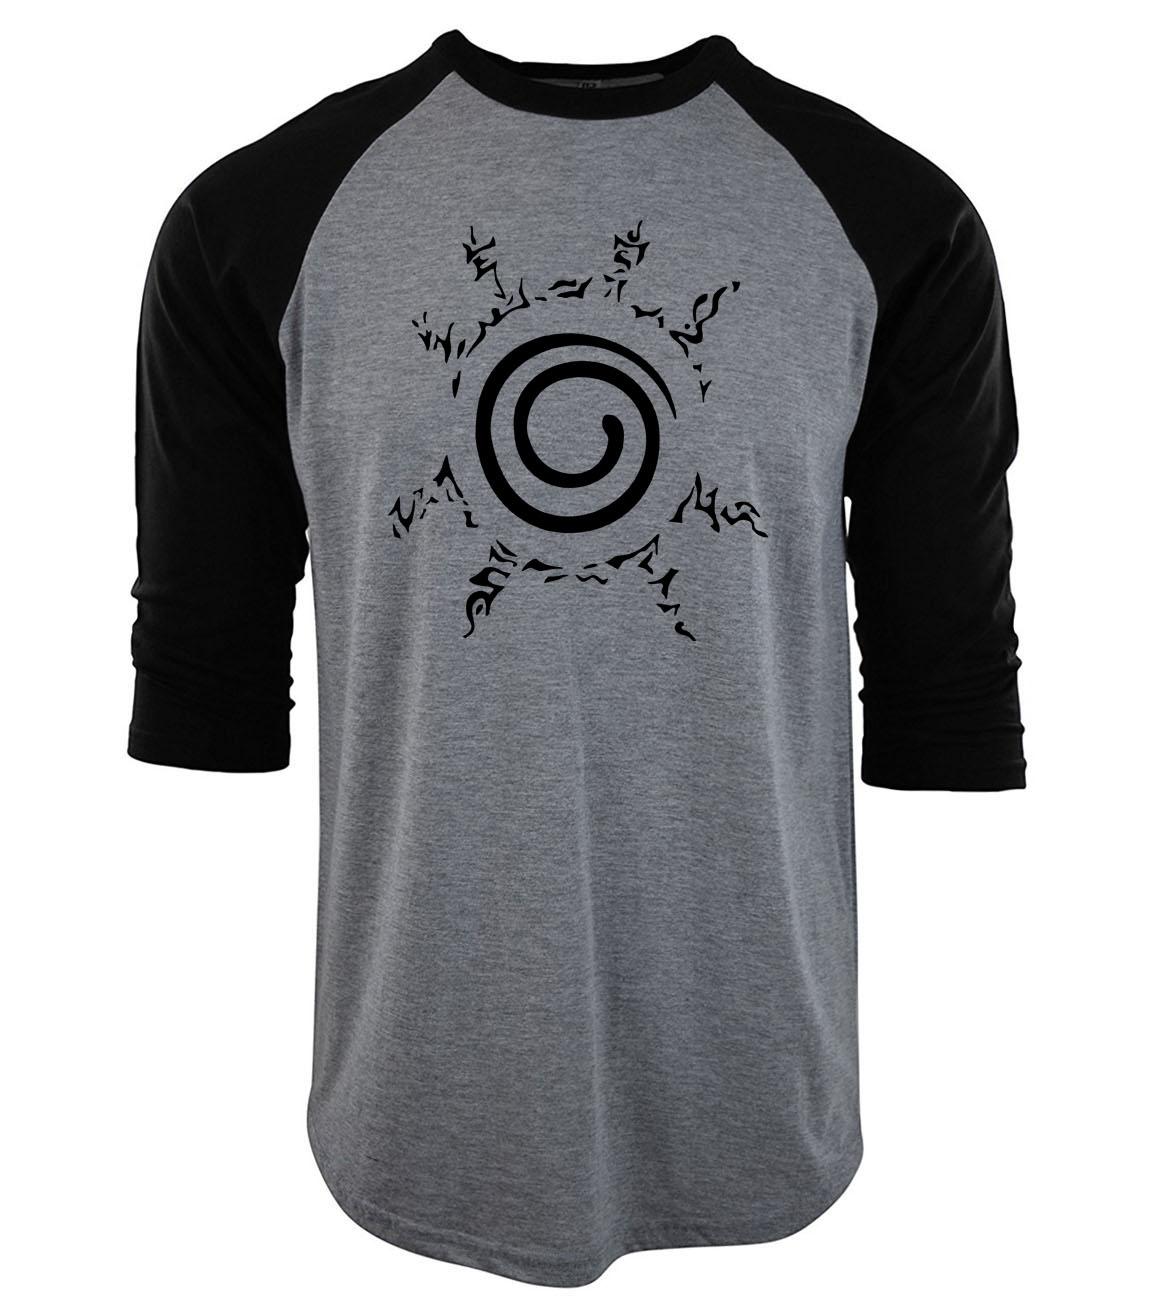 mens t shirts fashion 2019 poleras hombre man clothing funny three-quarter sleeve t-shirt men Uzumaki Naruto raglan camiseta